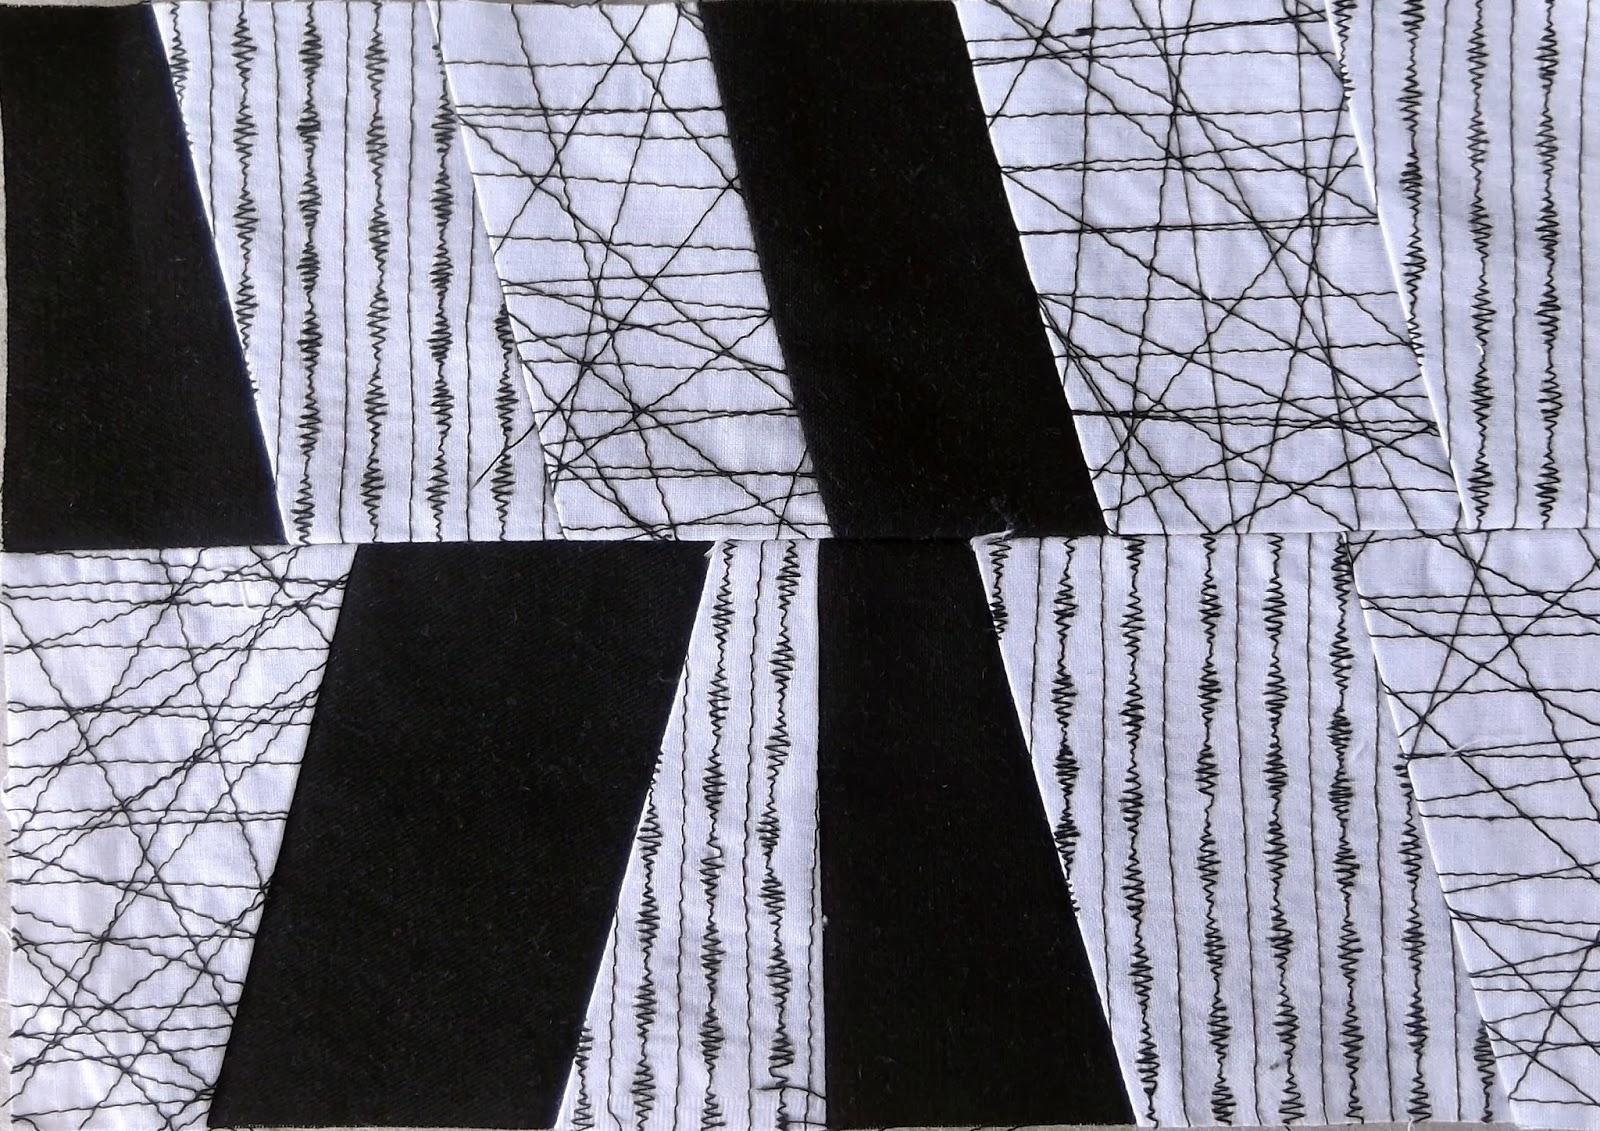 patchwork ασπρόμαυρο, patchwork φωτογραφίες, patchwork σχέδια, patchwork ιδέες, patchwork